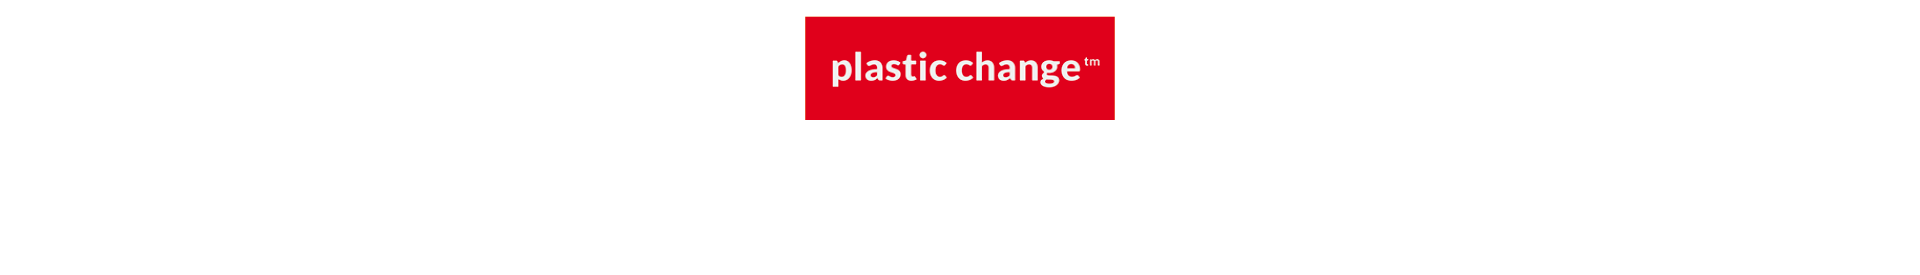 Case_PlasticChange5.png